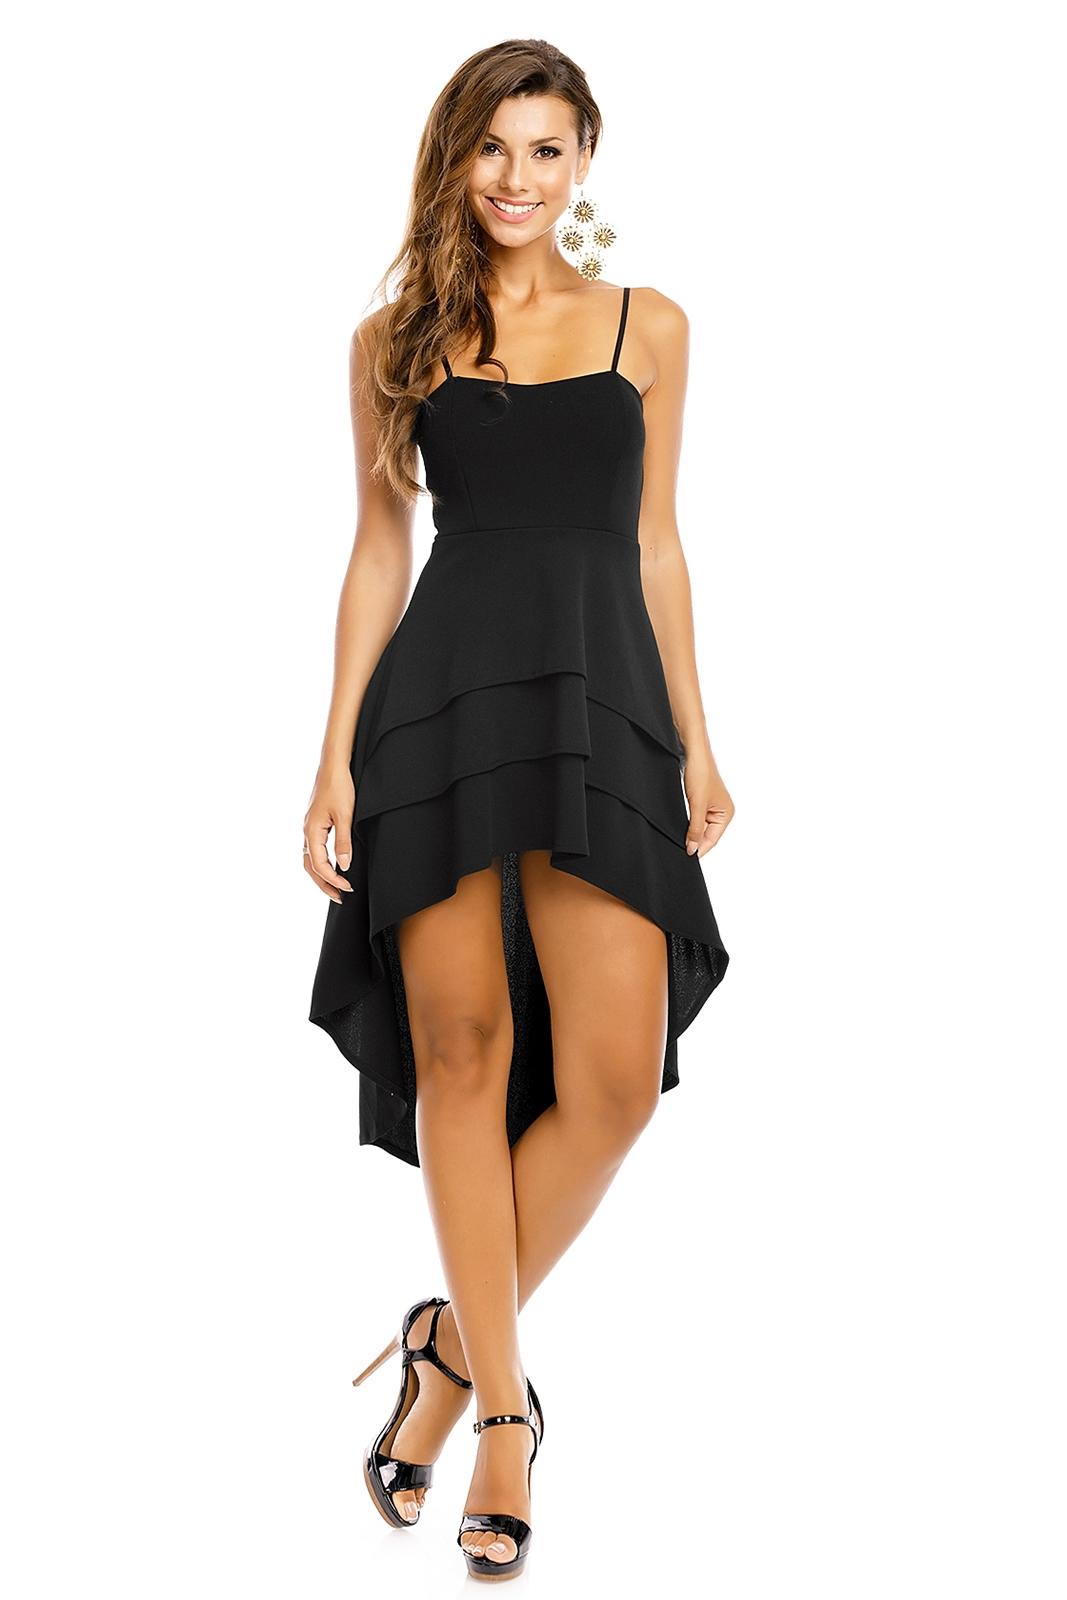 vokuhila kleid bandeaukleid tr gerkleid volant faltenkleid dress abendkleid sw l ebay. Black Bedroom Furniture Sets. Home Design Ideas